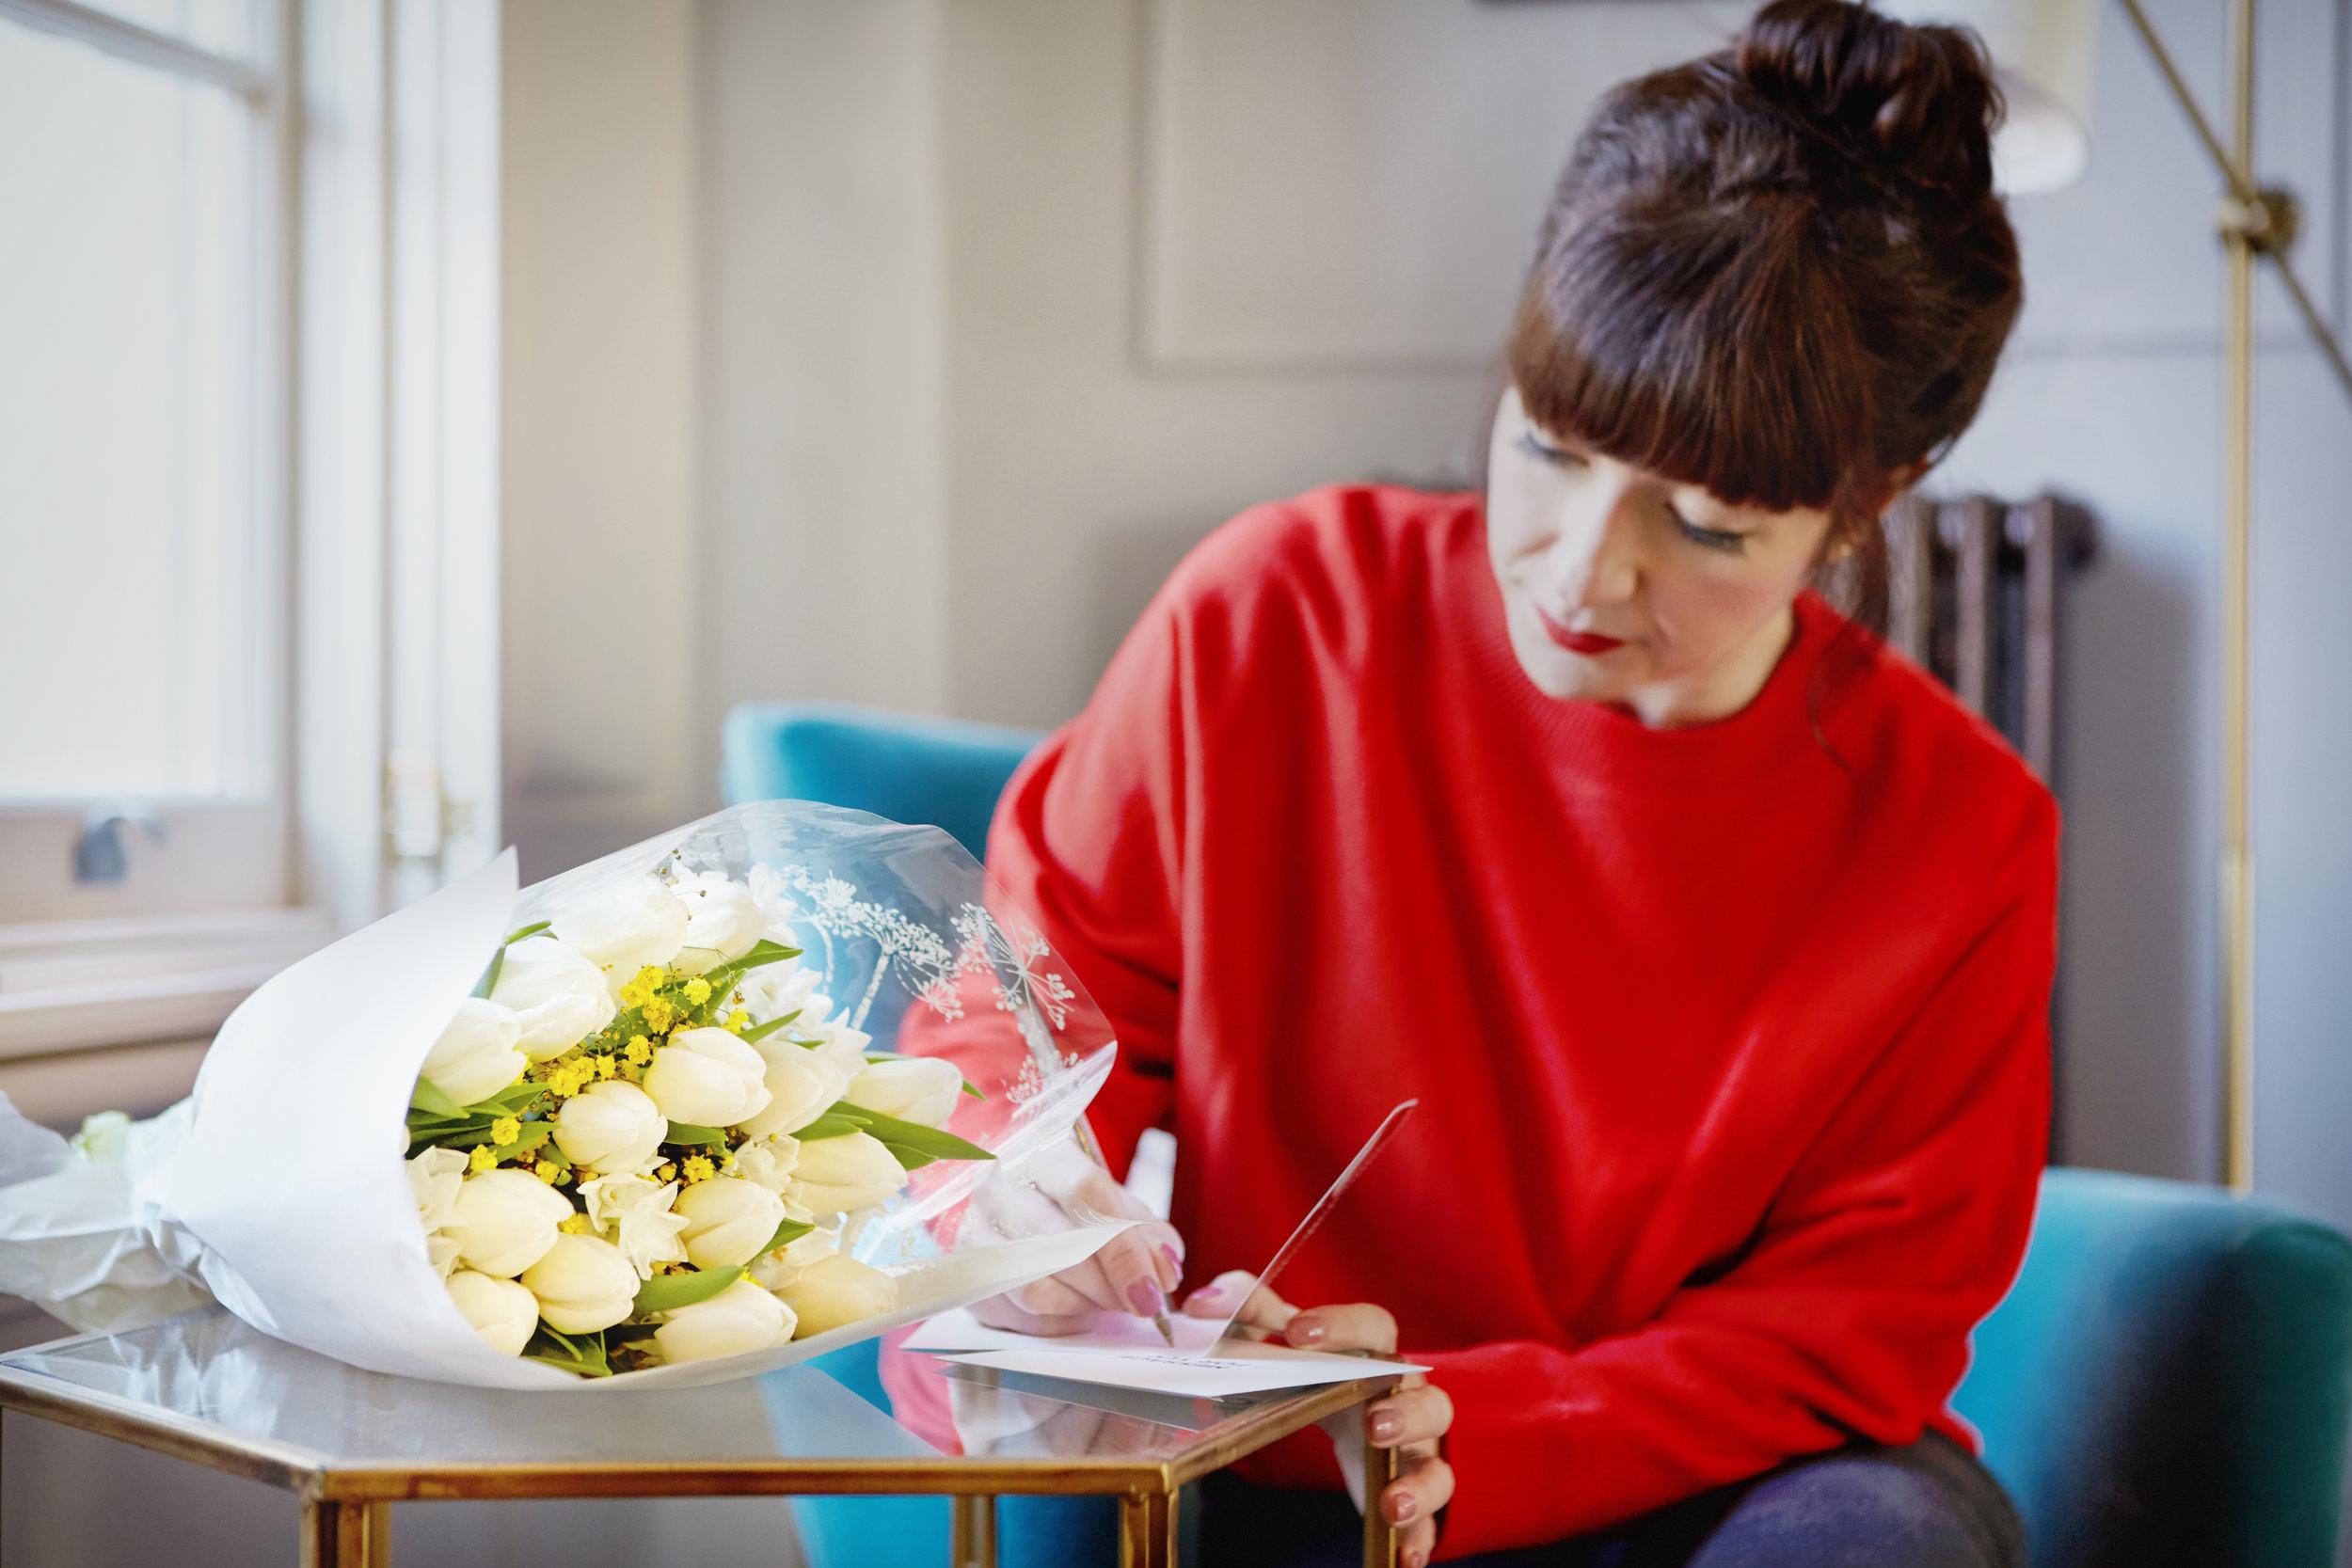 Melanie_Lissack_M&S_Flowers_017_Review.jpg